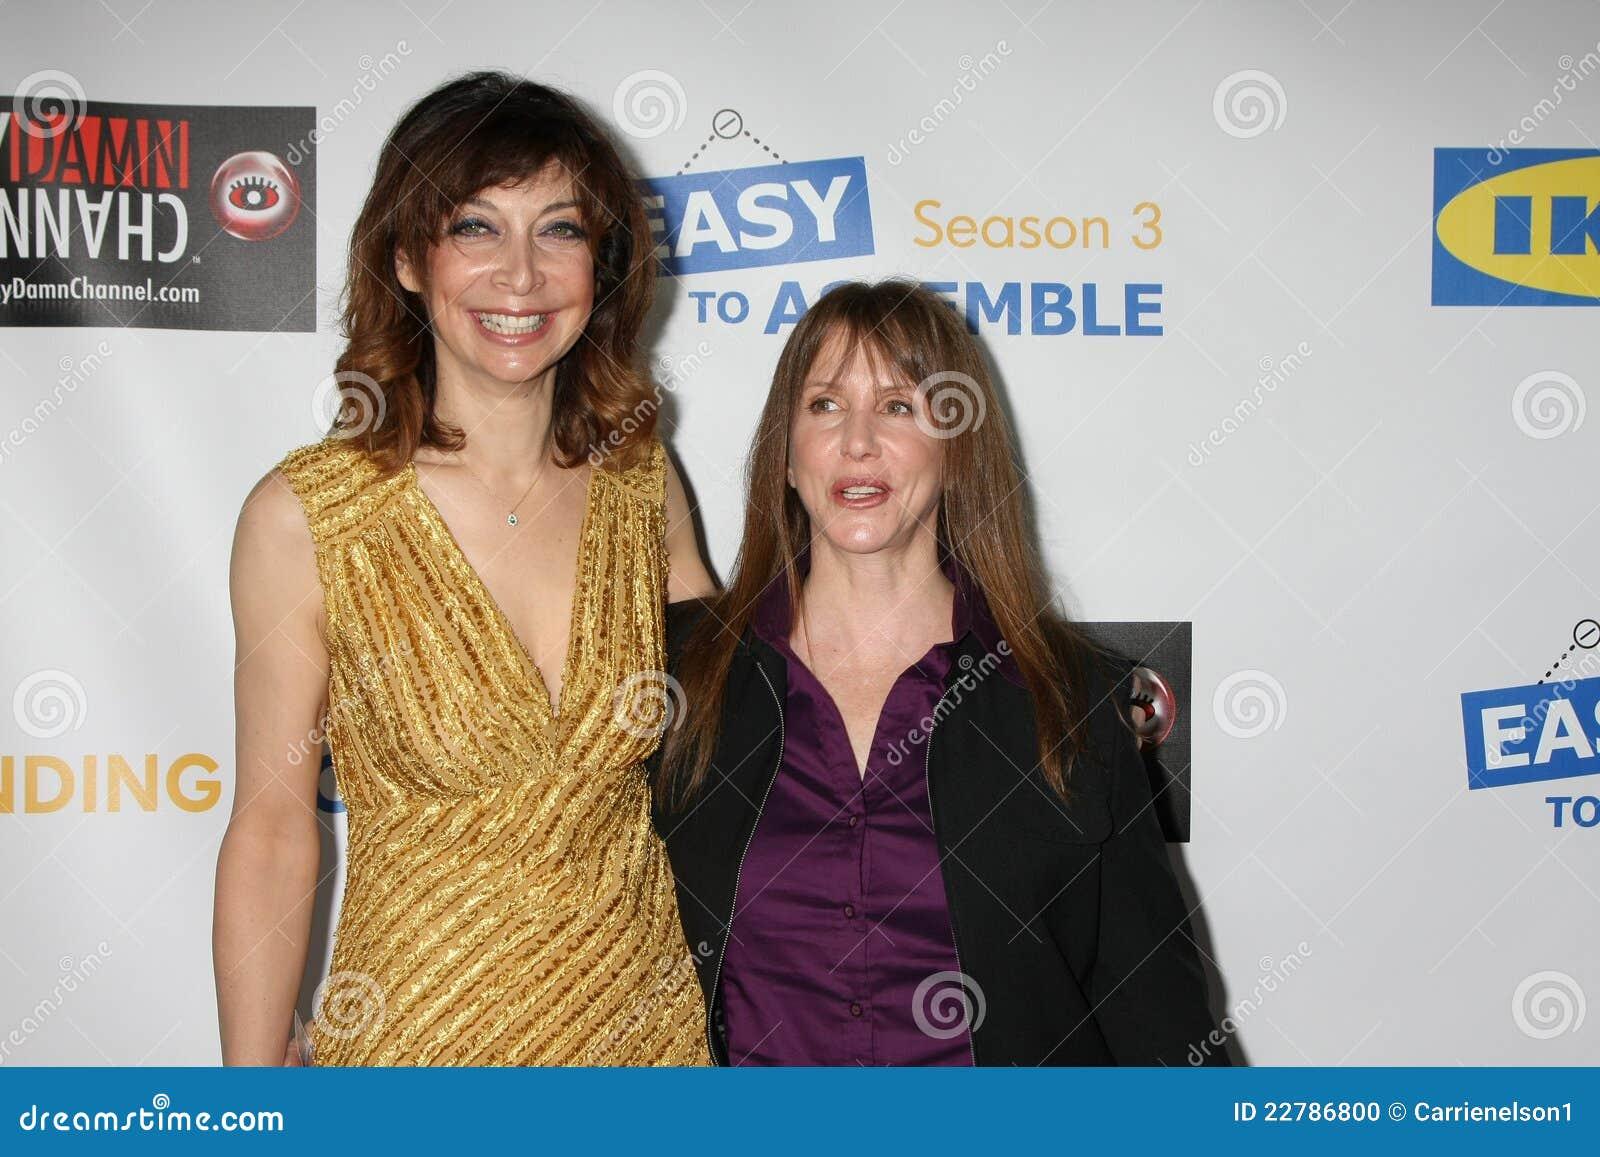 Mary Lou Retton 5 Olympic medals,Rosa Salazar XXX photo Leni Parker,Shawnae Jebbia